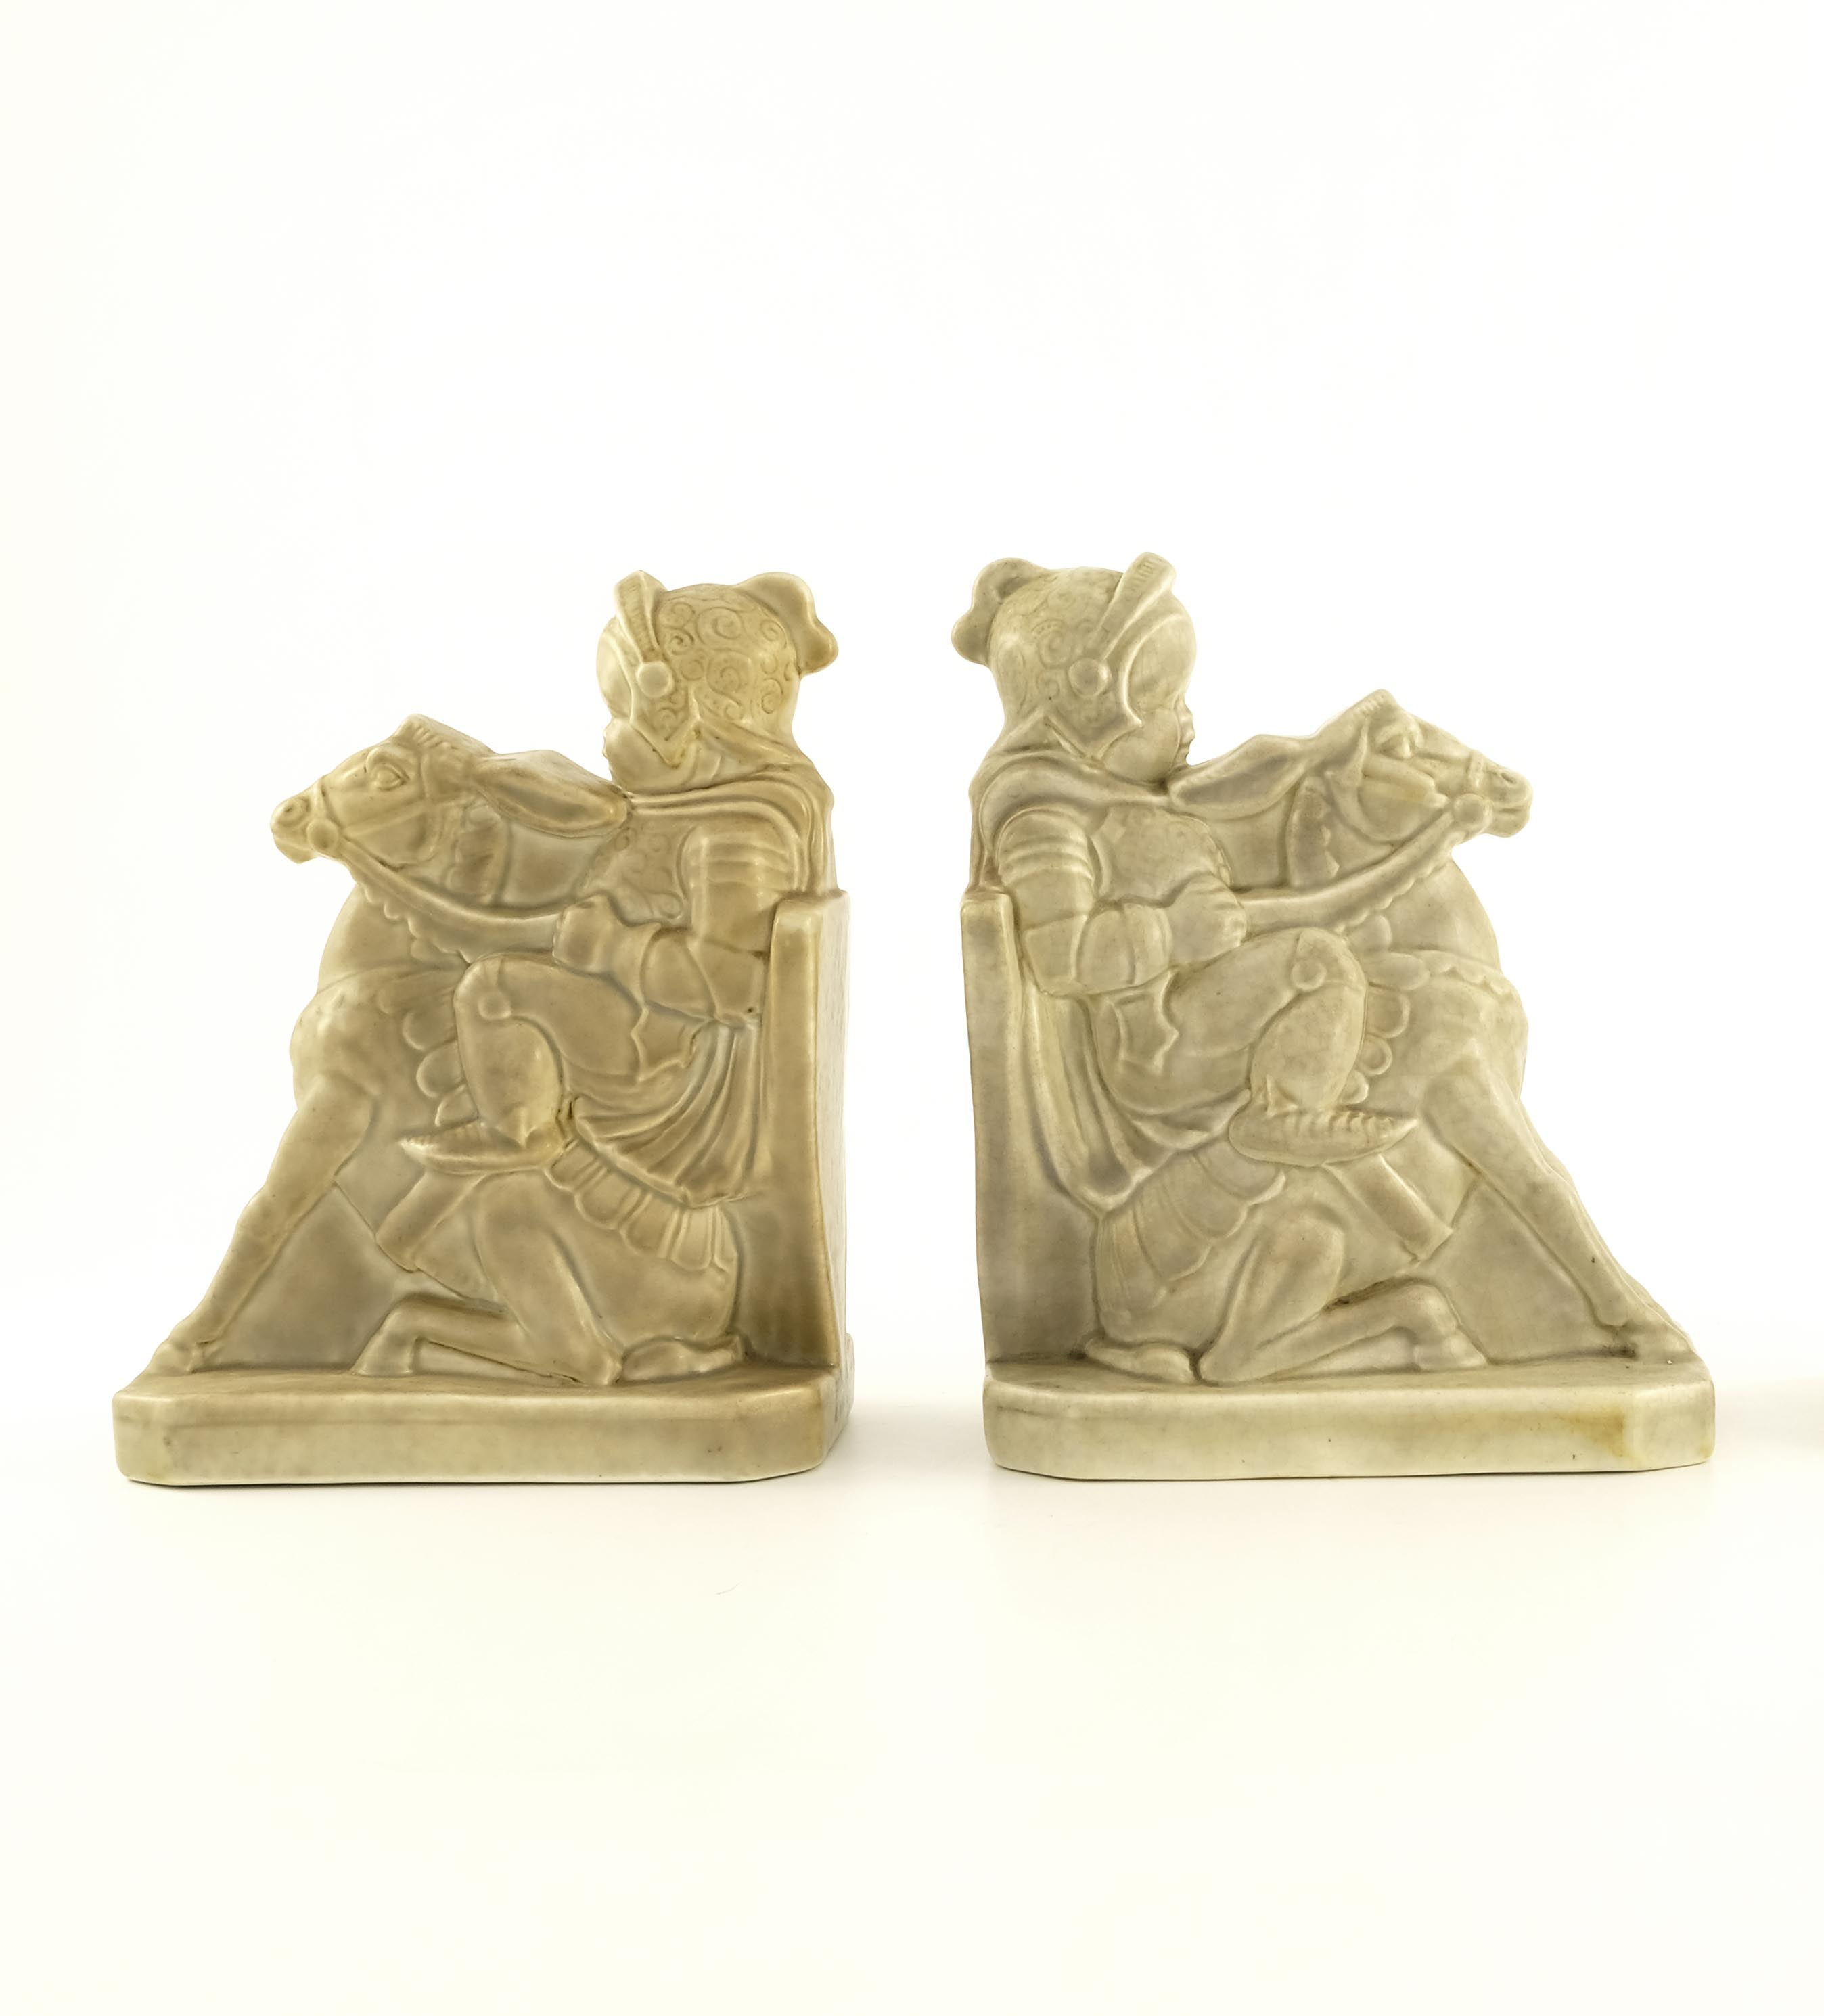 David Evans for Pilkington, a pair of Royal Lancas - Image 10 of 10